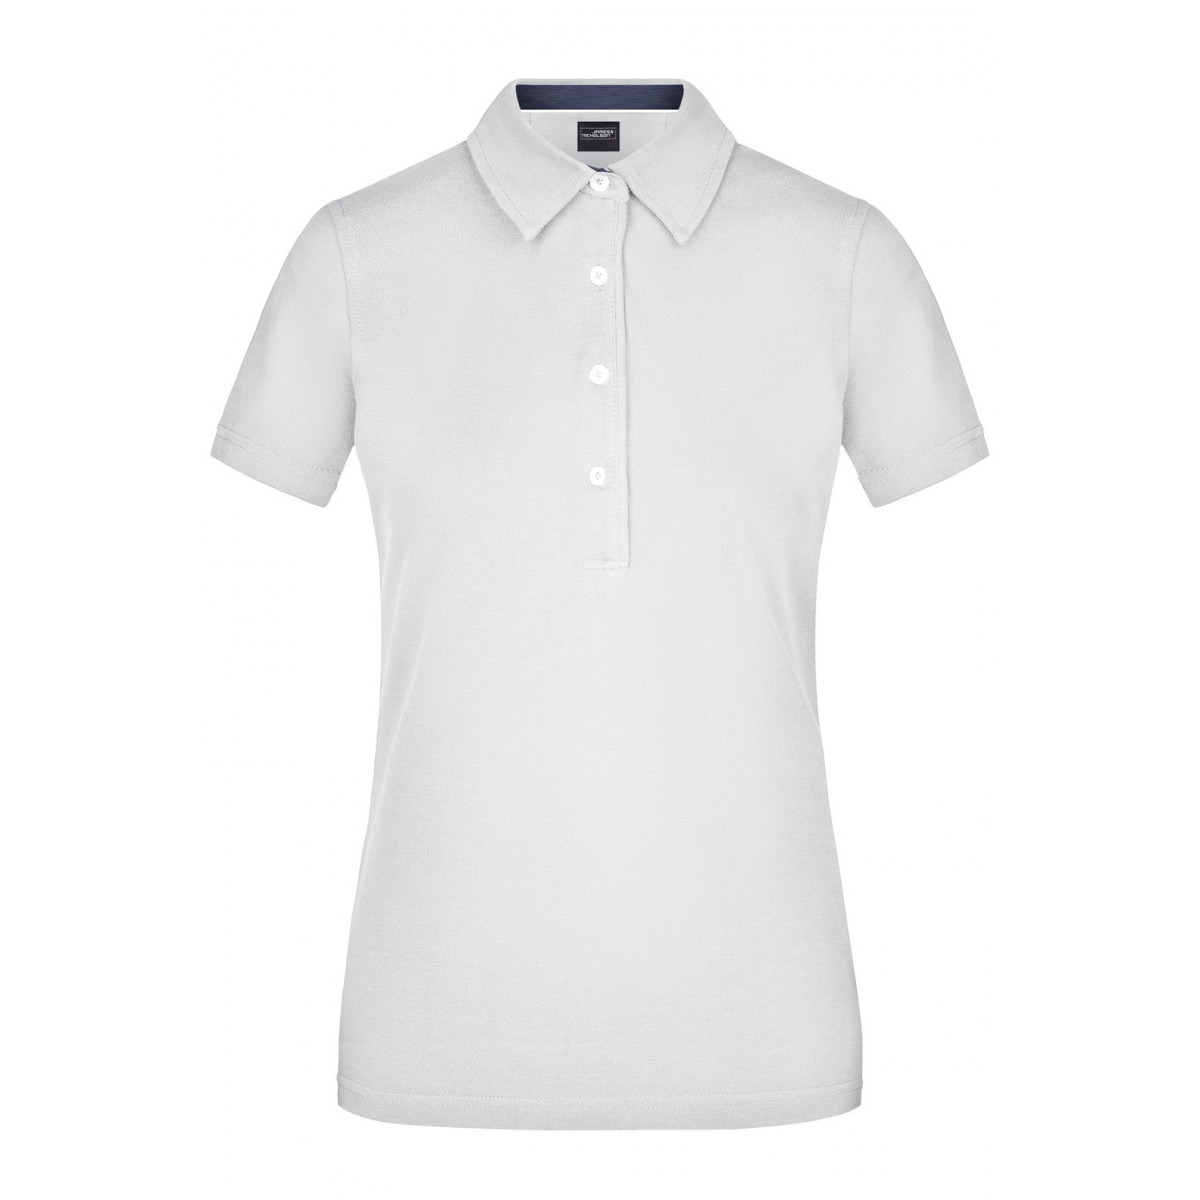 Рубашка поло женская JN969 Ladies Plain Polo - Белый/Джинс